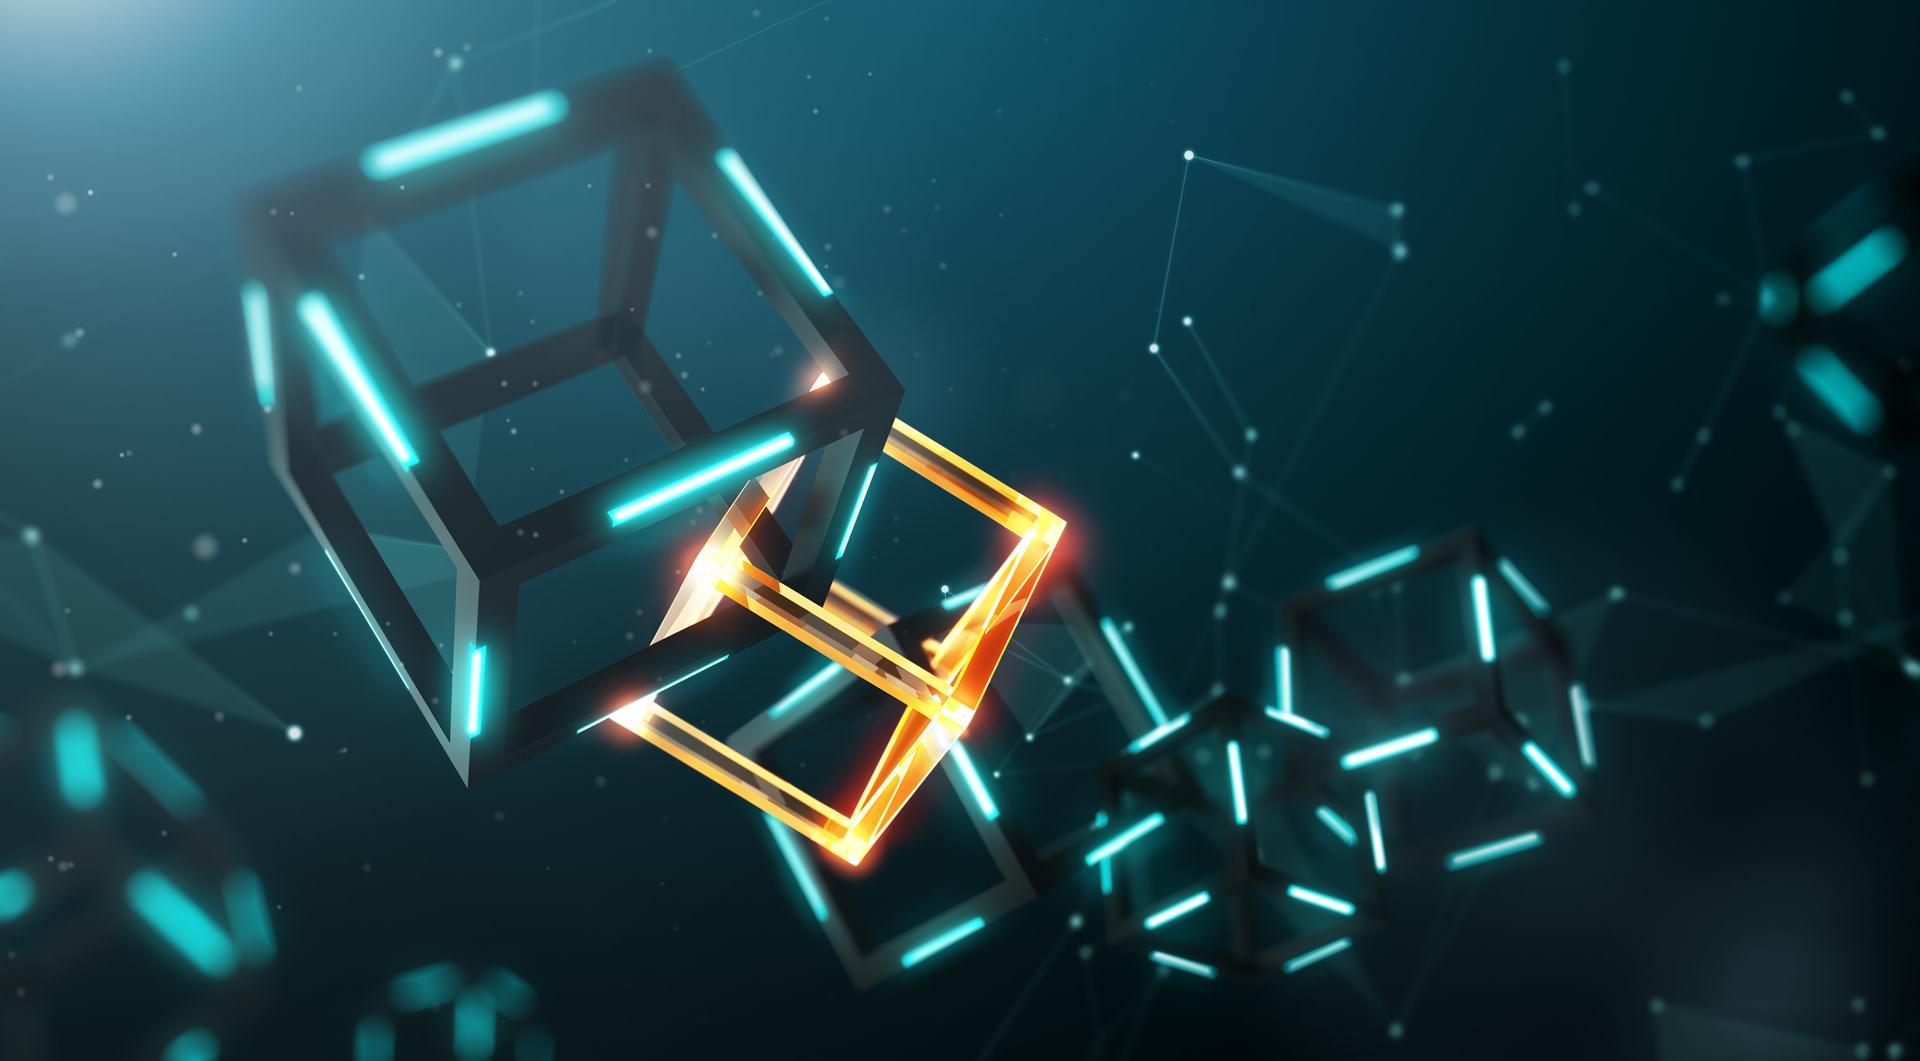 Биржа Binance запускает обеспеченный биткоином токен на Binance Chain